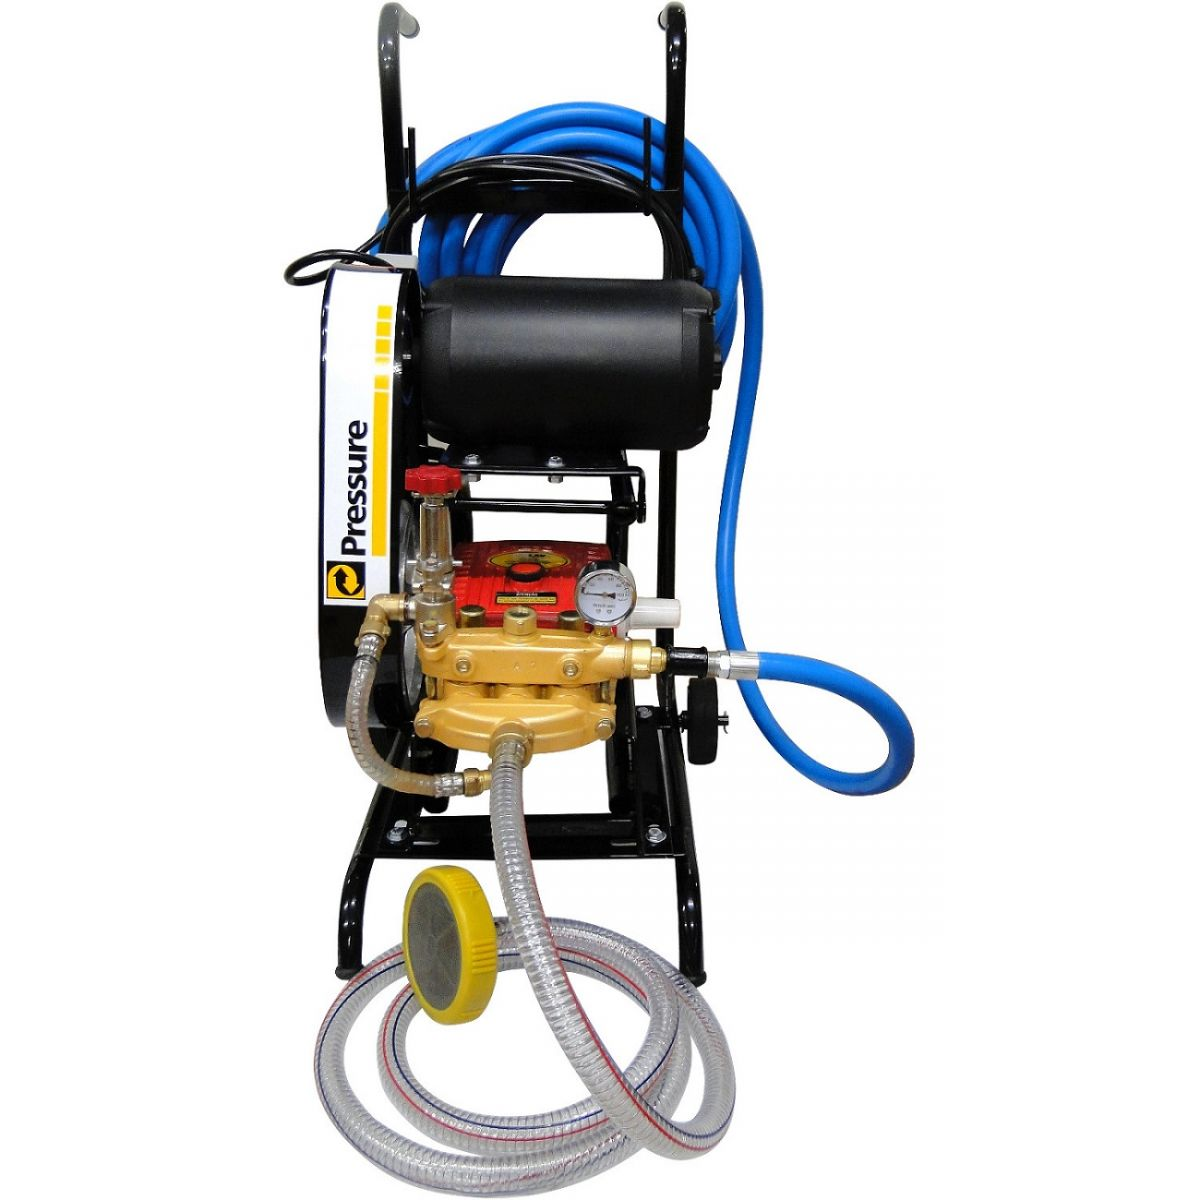 Lavadora PS LAV 400 4 Polos Completa Nacional Pressure monofásica - Pressure